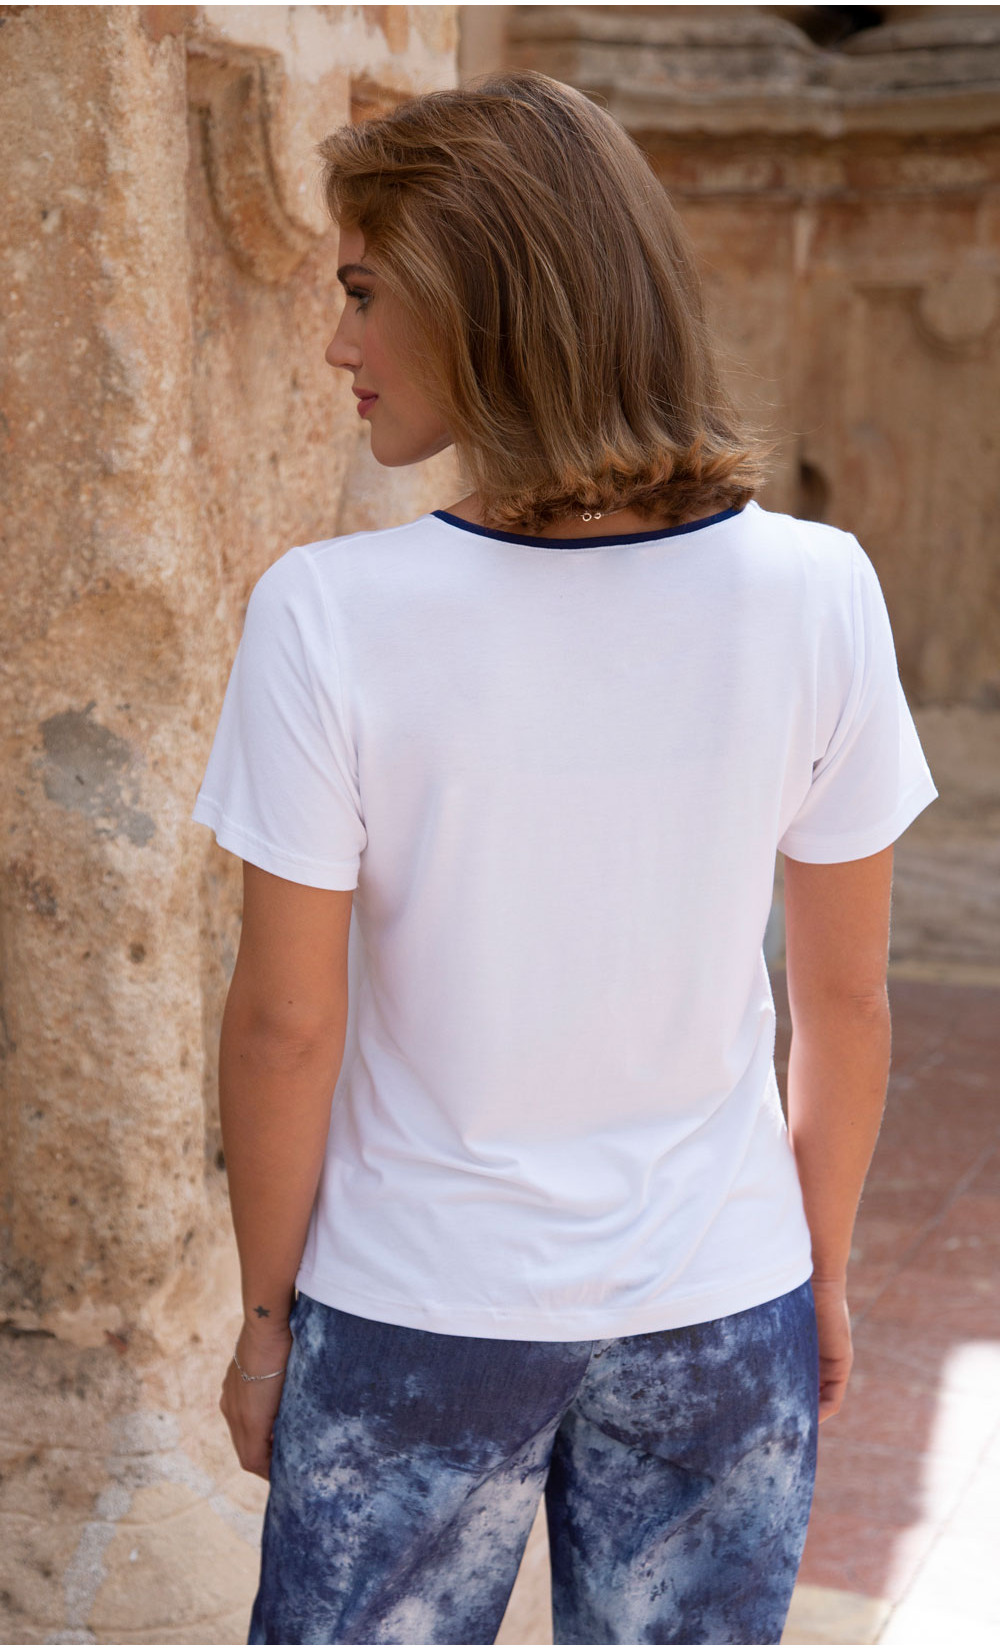 Tee shirt DAMERY. - DAMERY